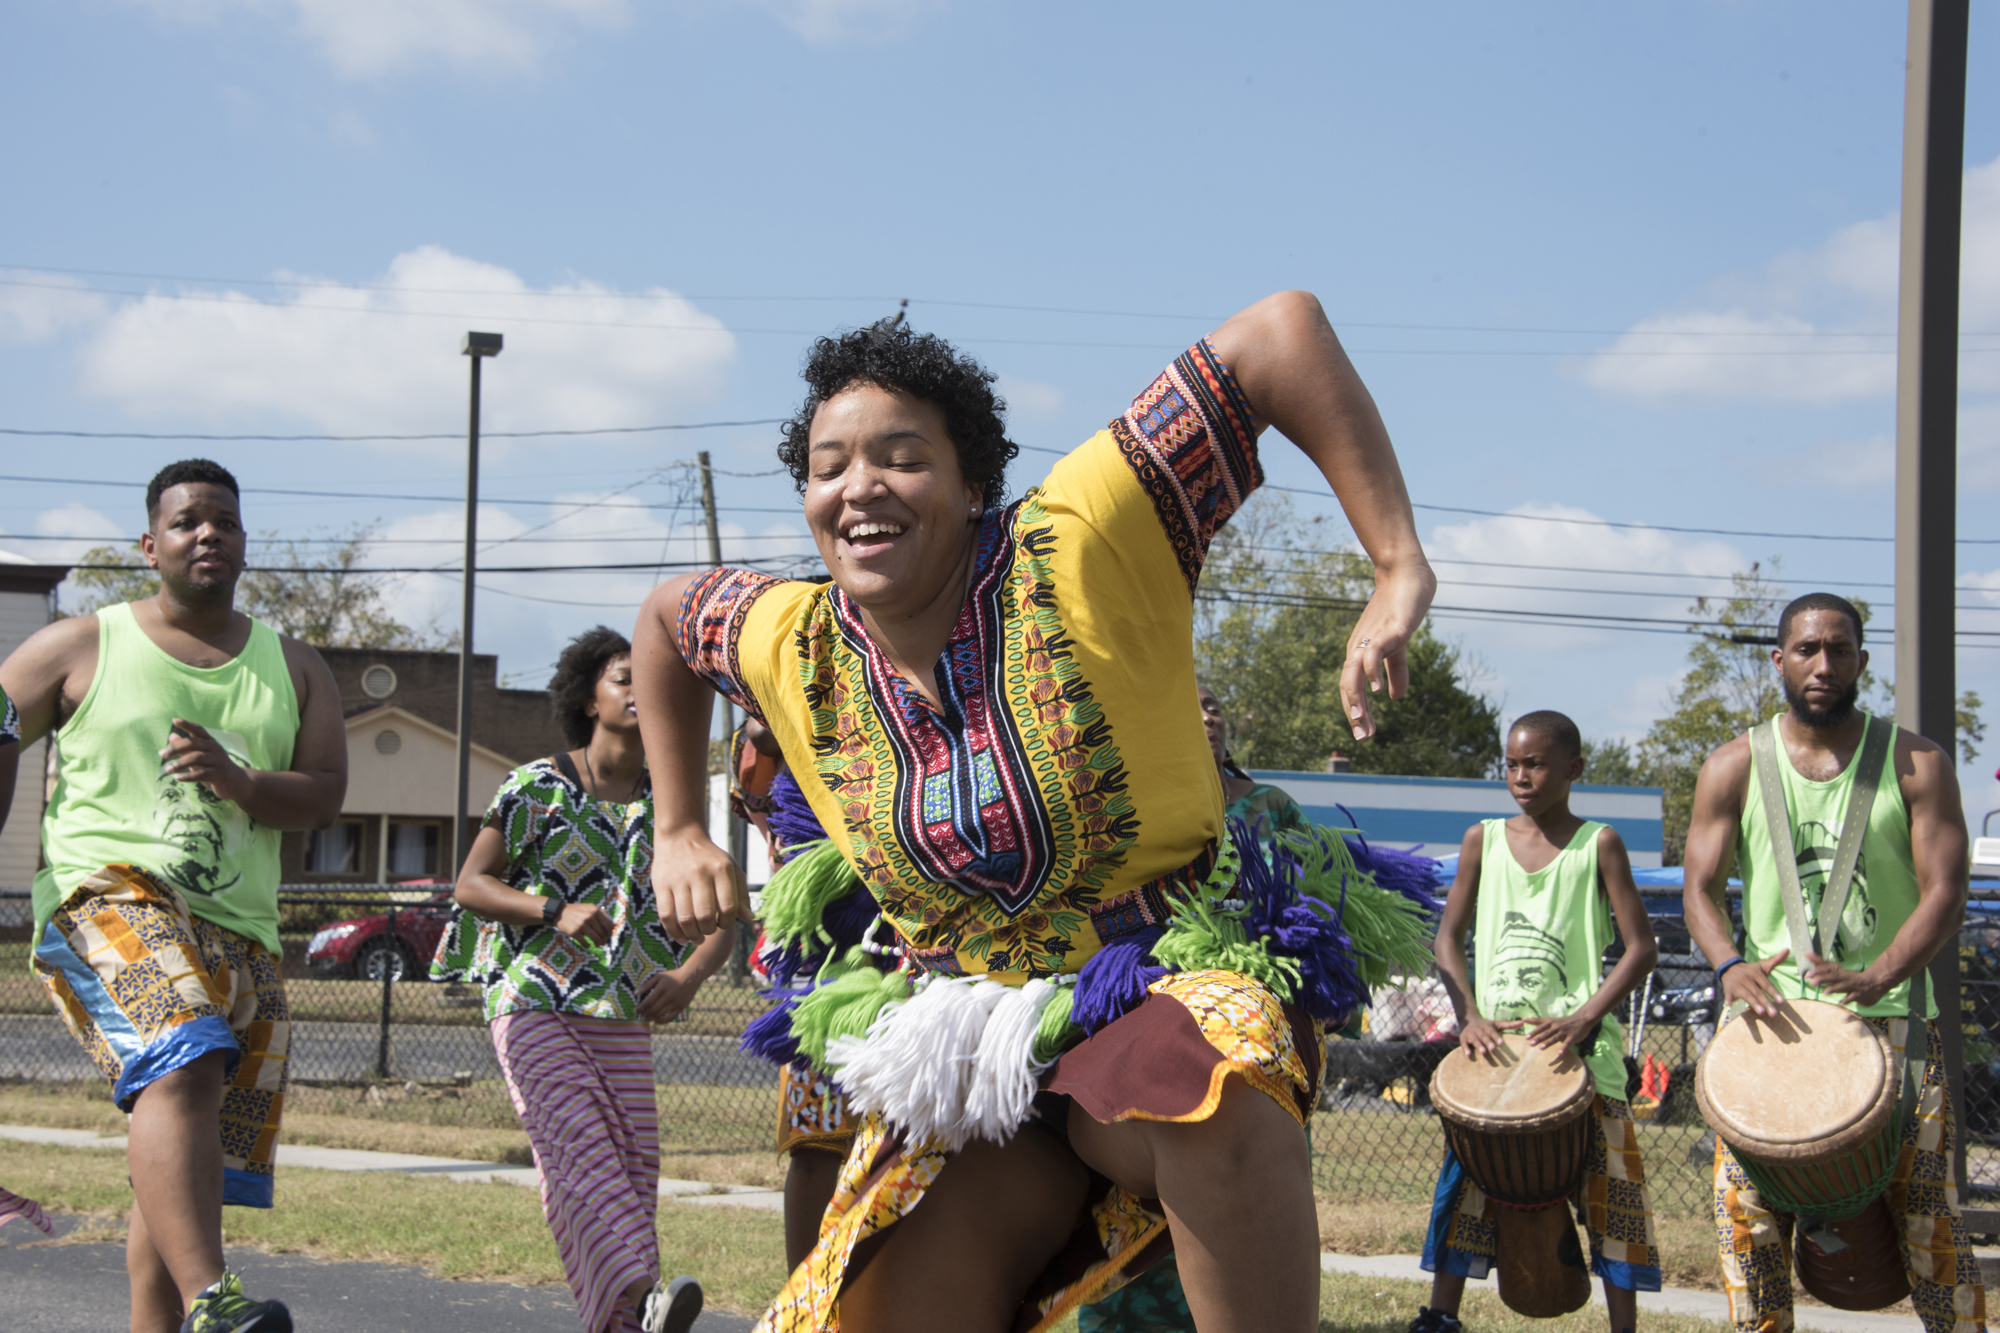 042 Ezibu African Dance Images [PC-Tom Topinka] 10-07-18.jpg